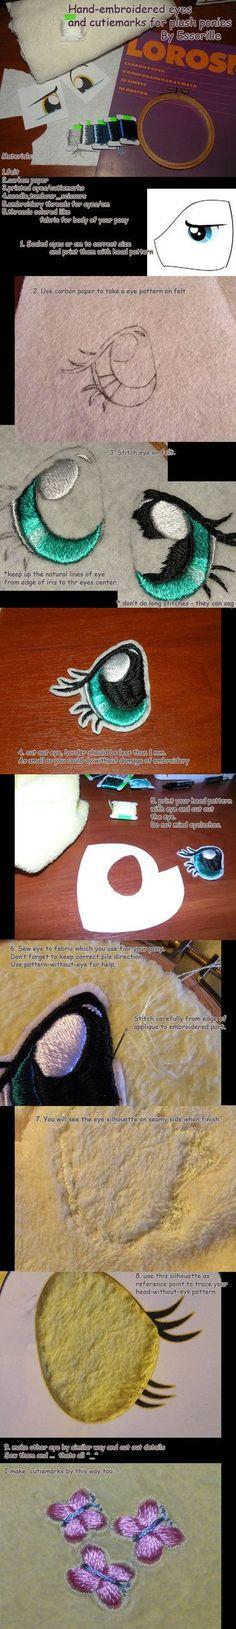 hand-embroidered plush eyes tutorial by Essorille on DeviantArt